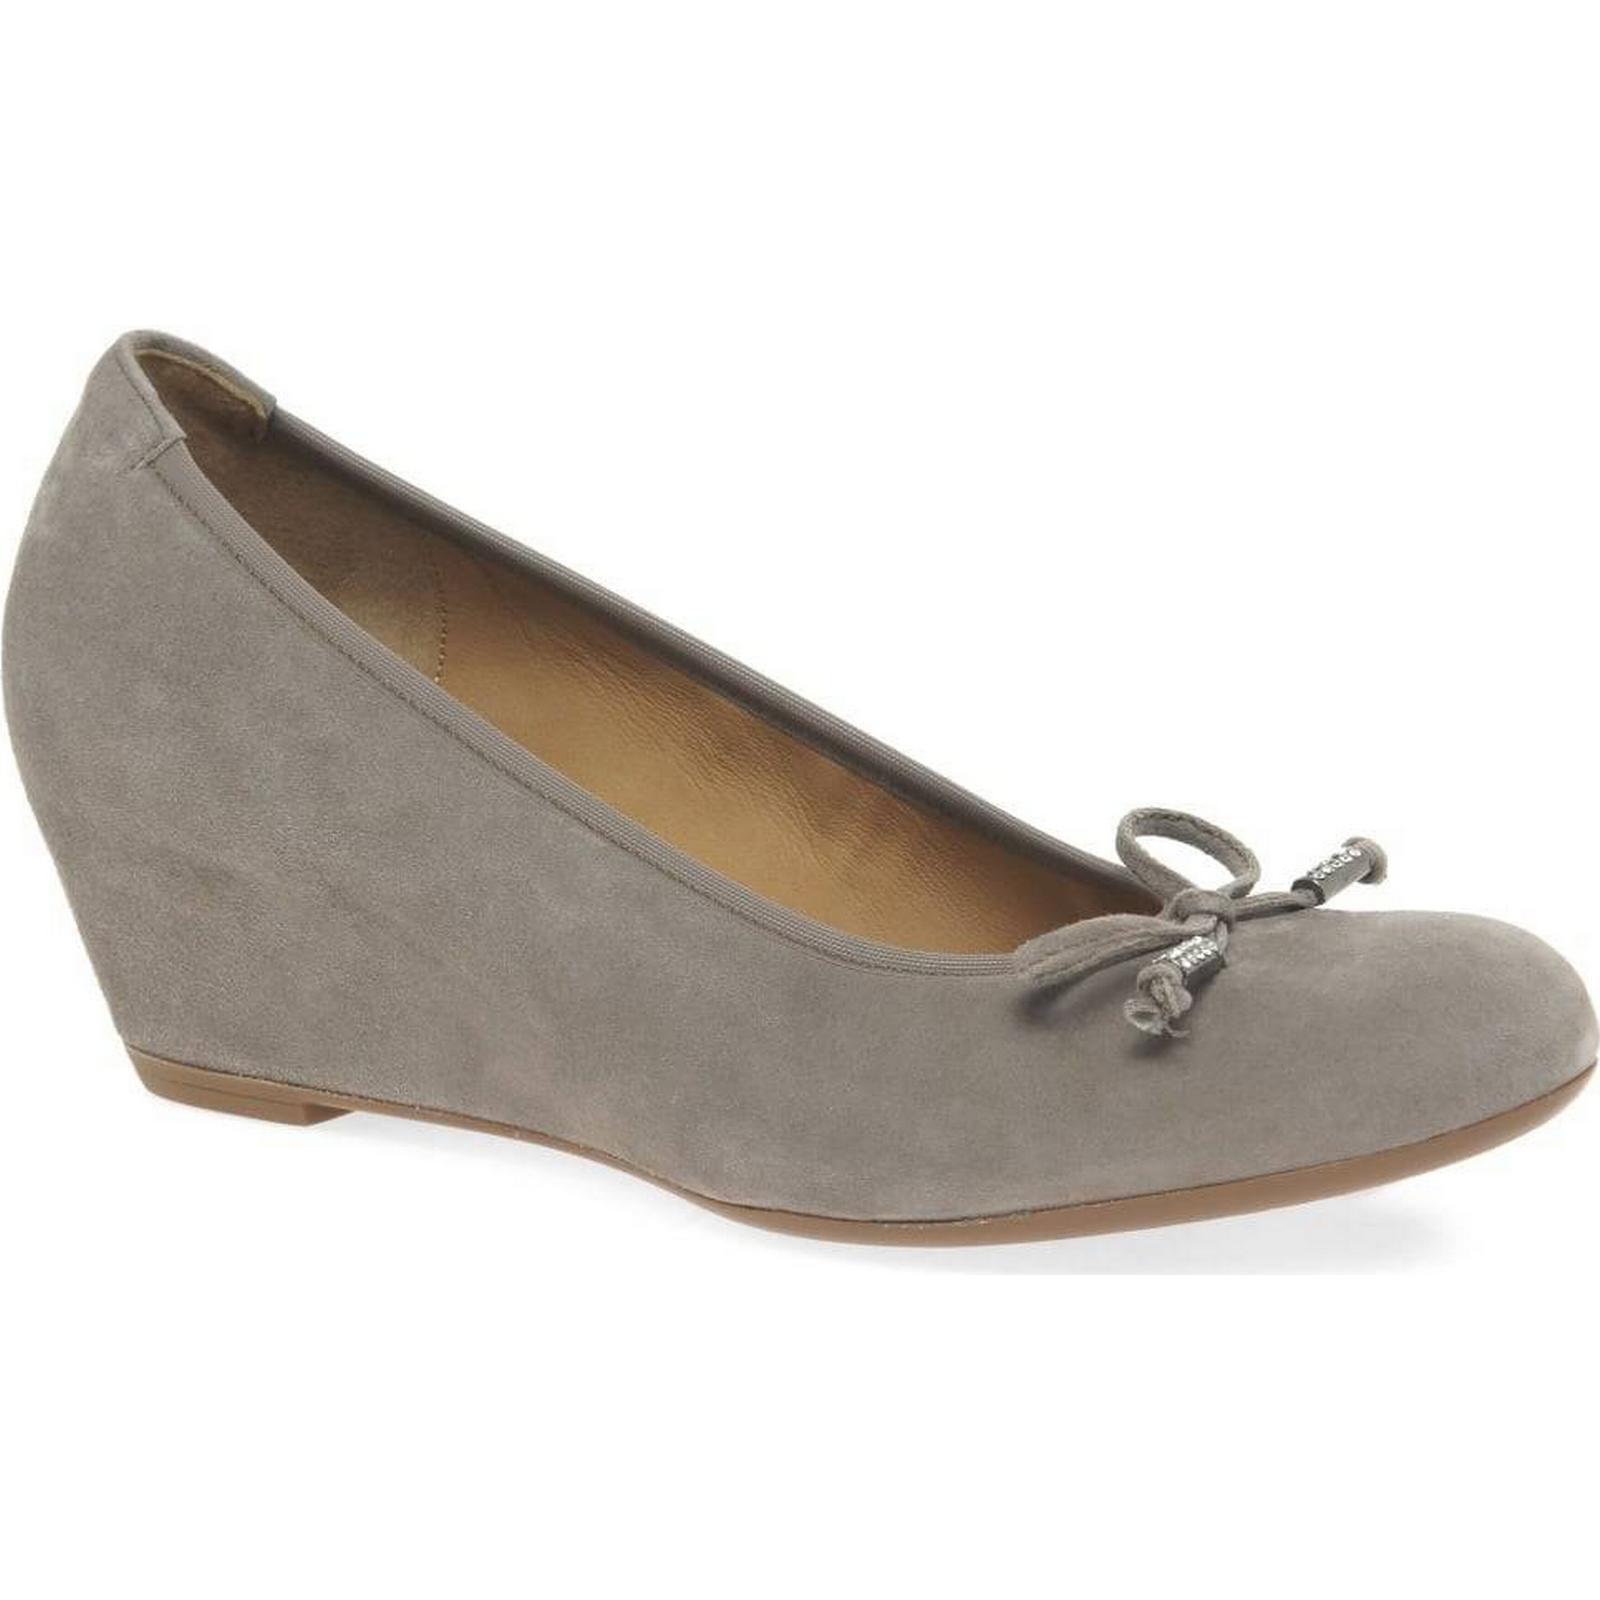 Gabor Colour: Alvin Womens Casual Shoes Colour: Gabor Kiesel Suede, Size: 9 fa2728